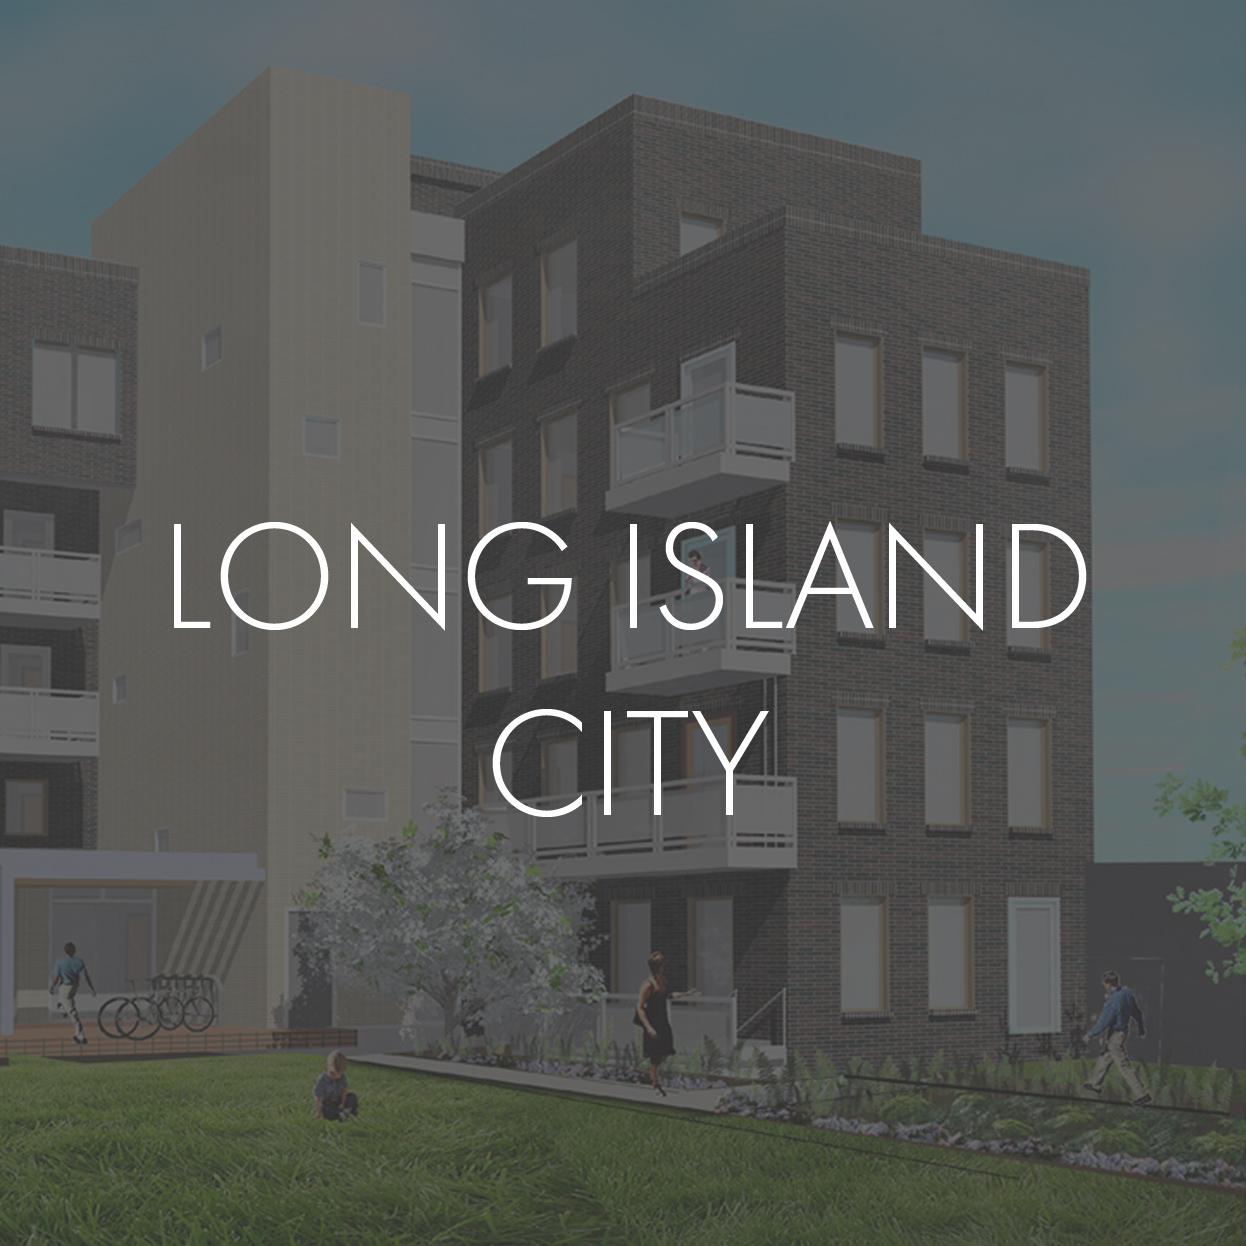 02_THUMBNAIL long island city.jpg